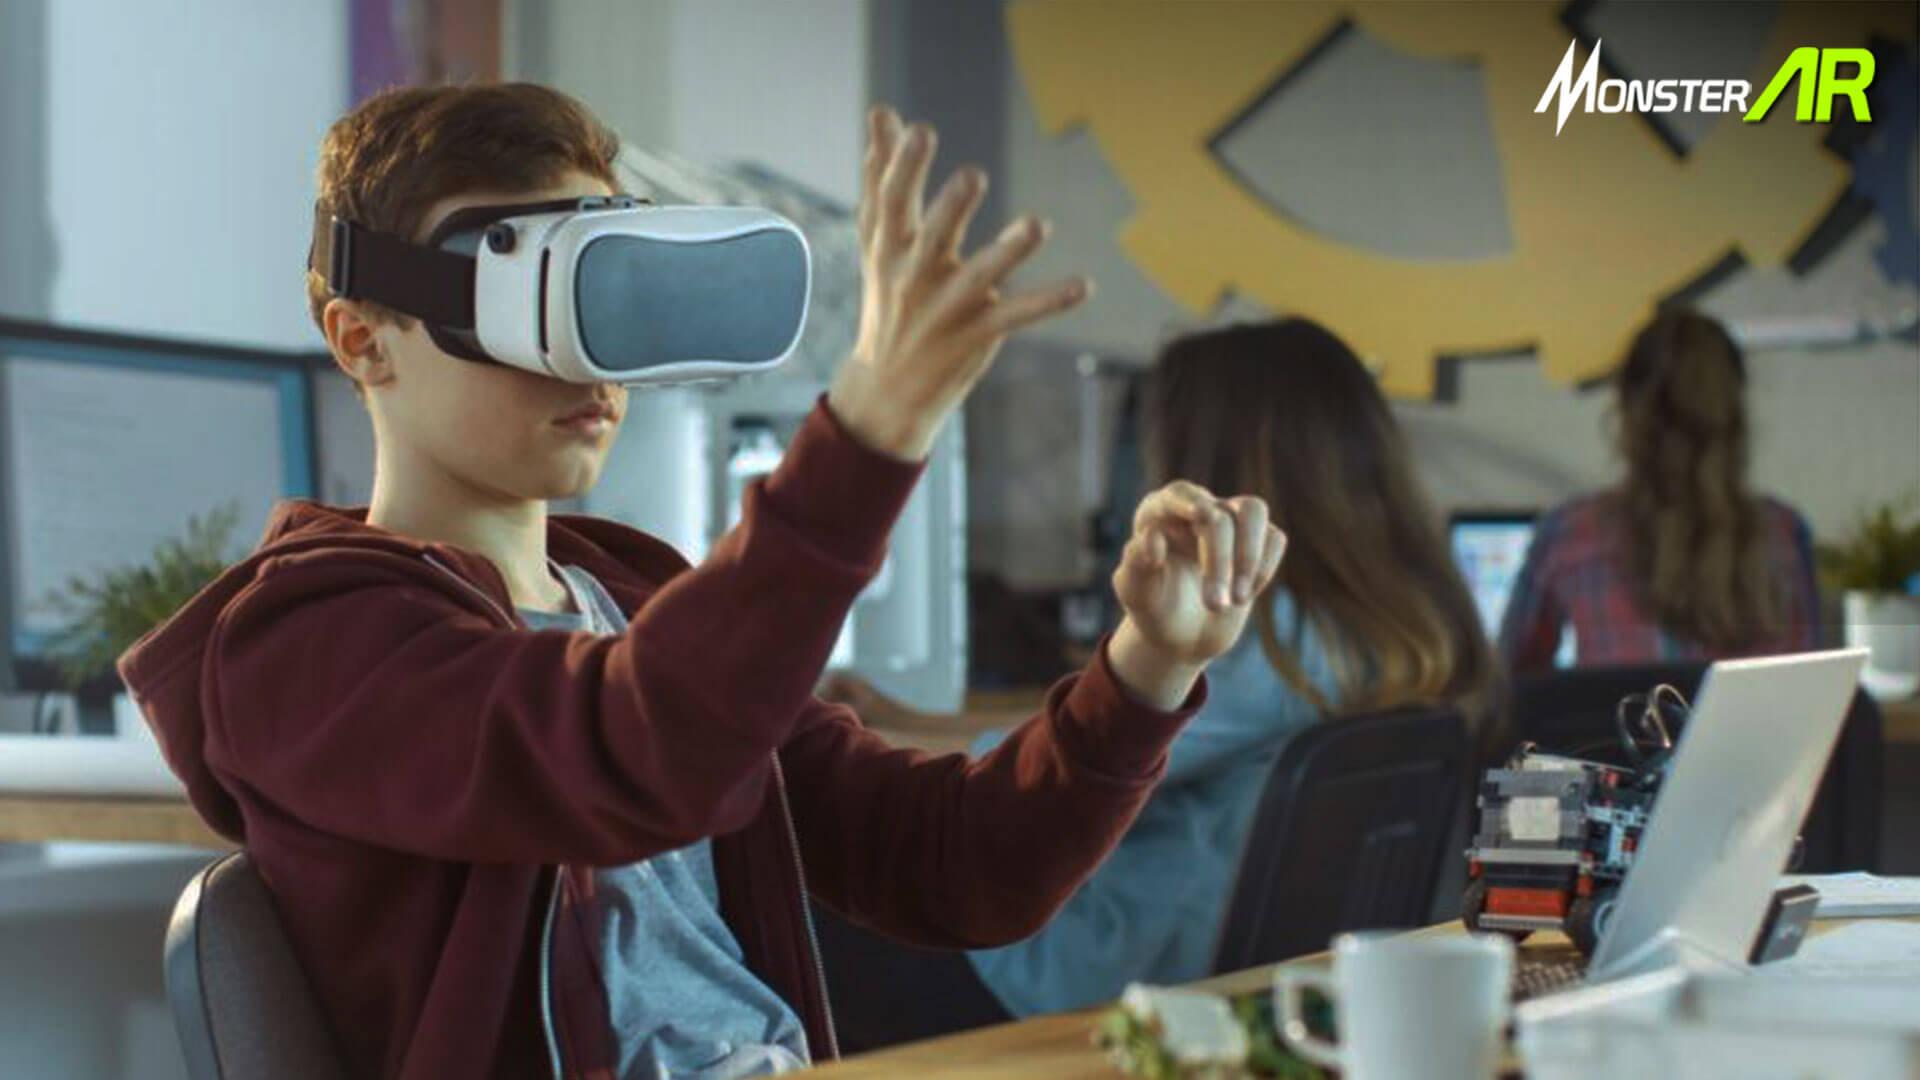 Teknologi AR/VR di Sekolah